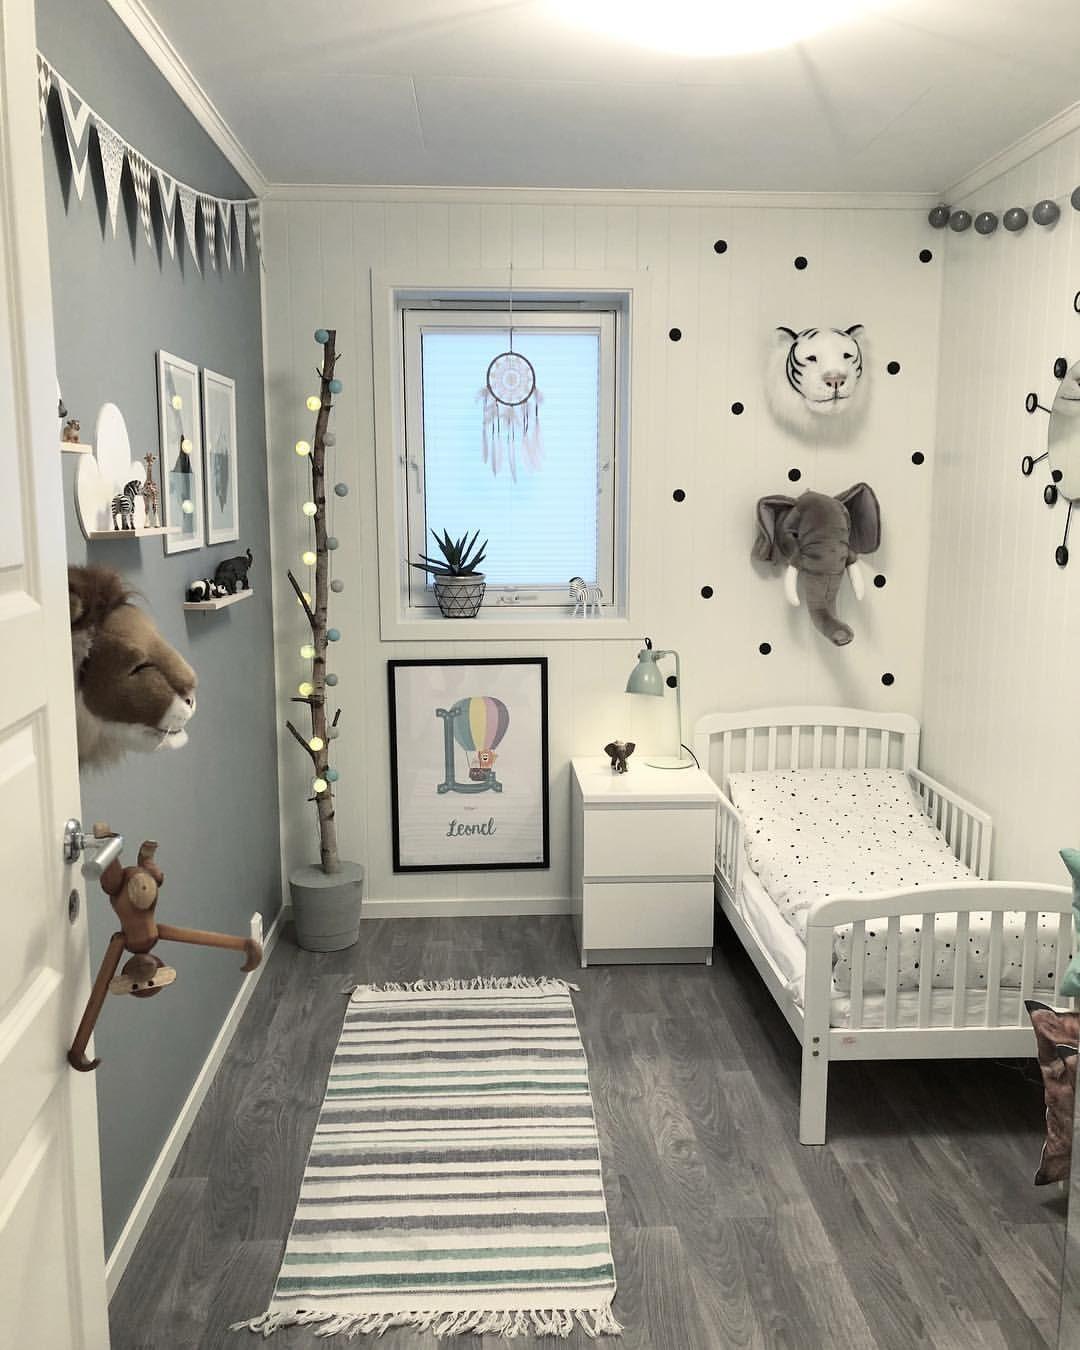 Happy Weekend Brigbysroomfriends Oyo Toddler Bedrooms Baby Room Decor Toddler Rooms Little boy room design